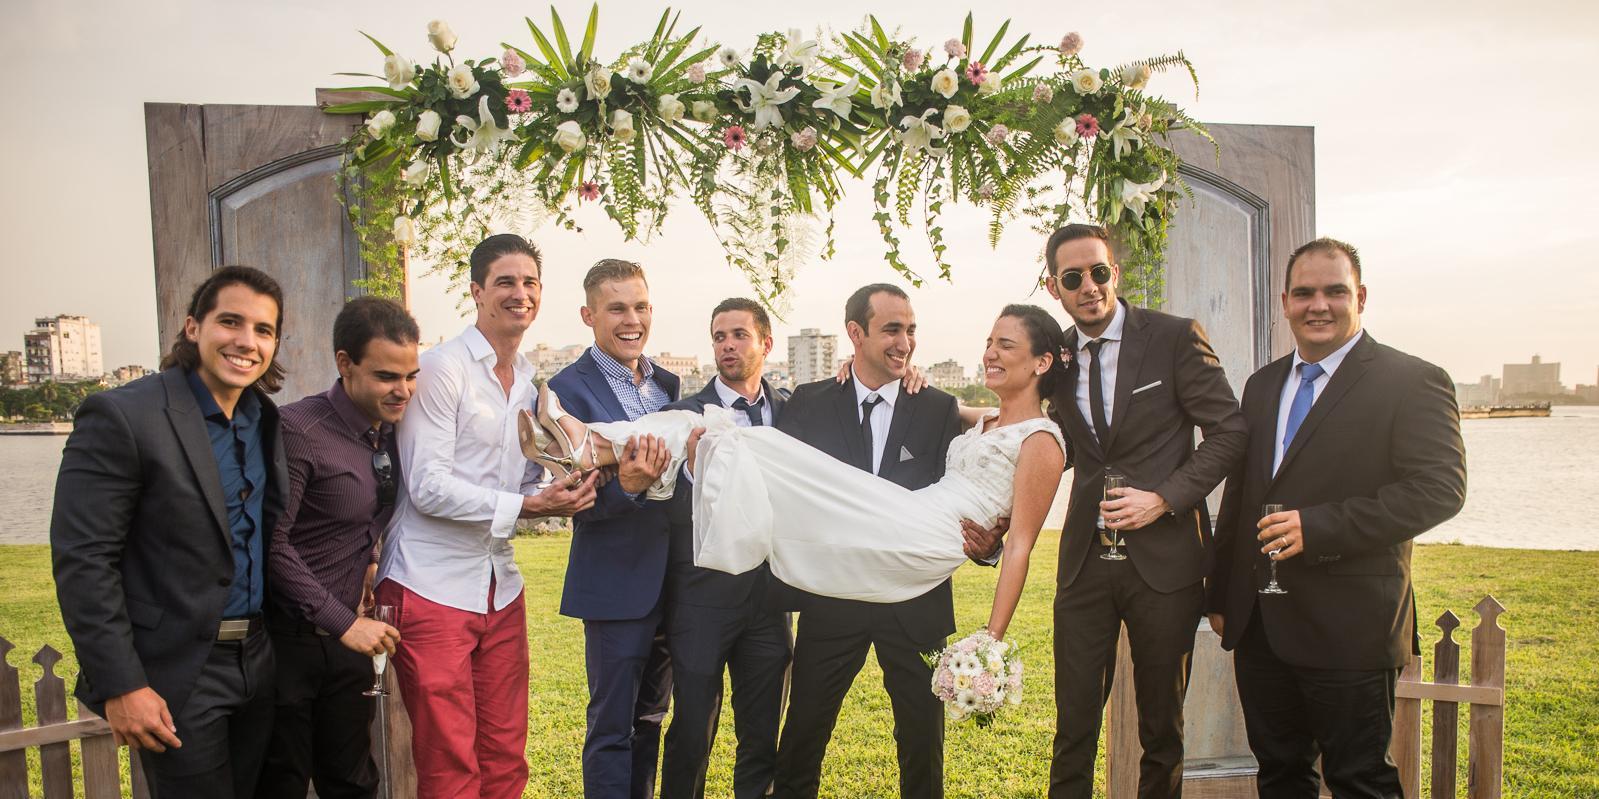 bodas-estilo-libre-jardin-cuba-8991.jpg